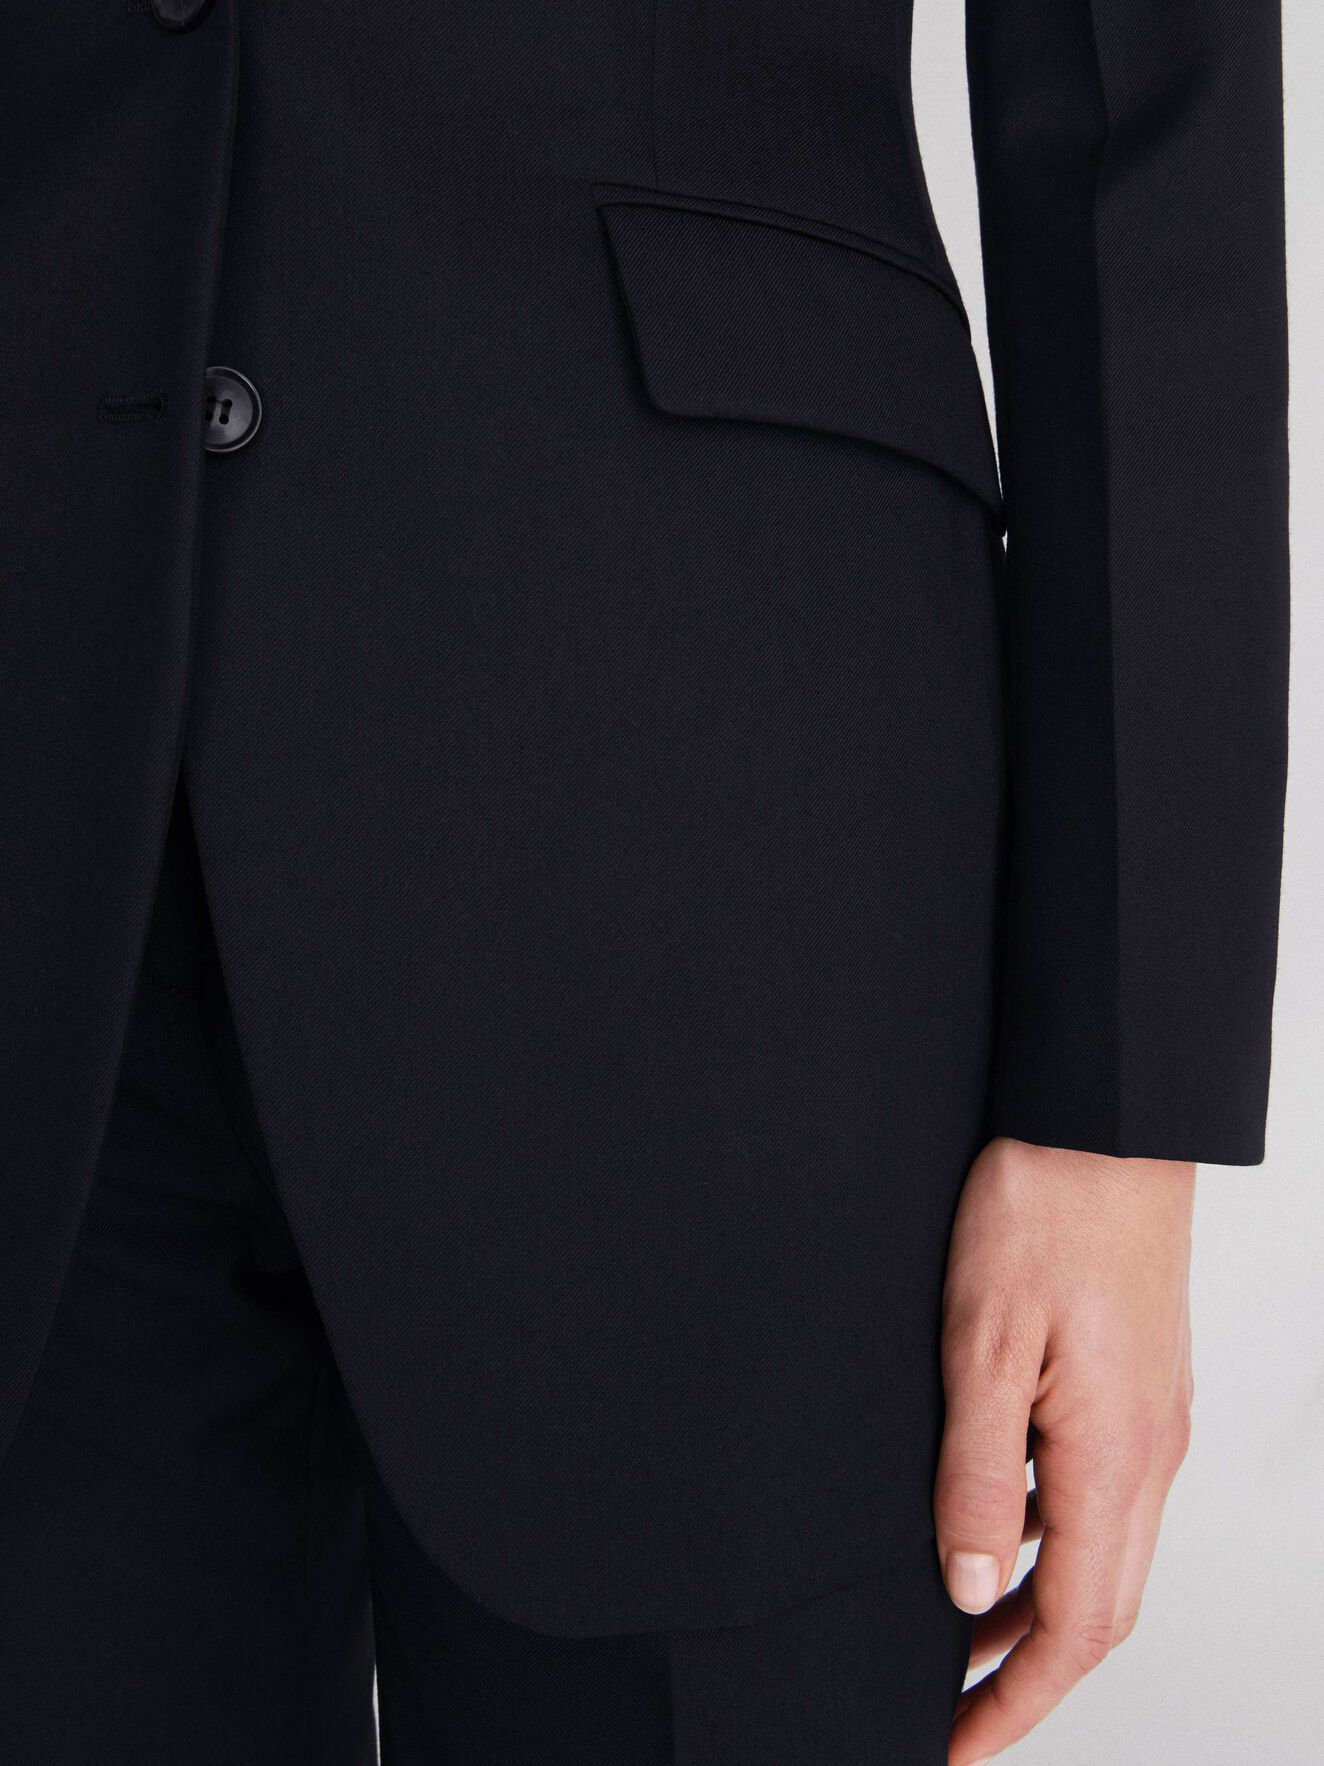 Salka Blazer in Black from Tiger of Sweden